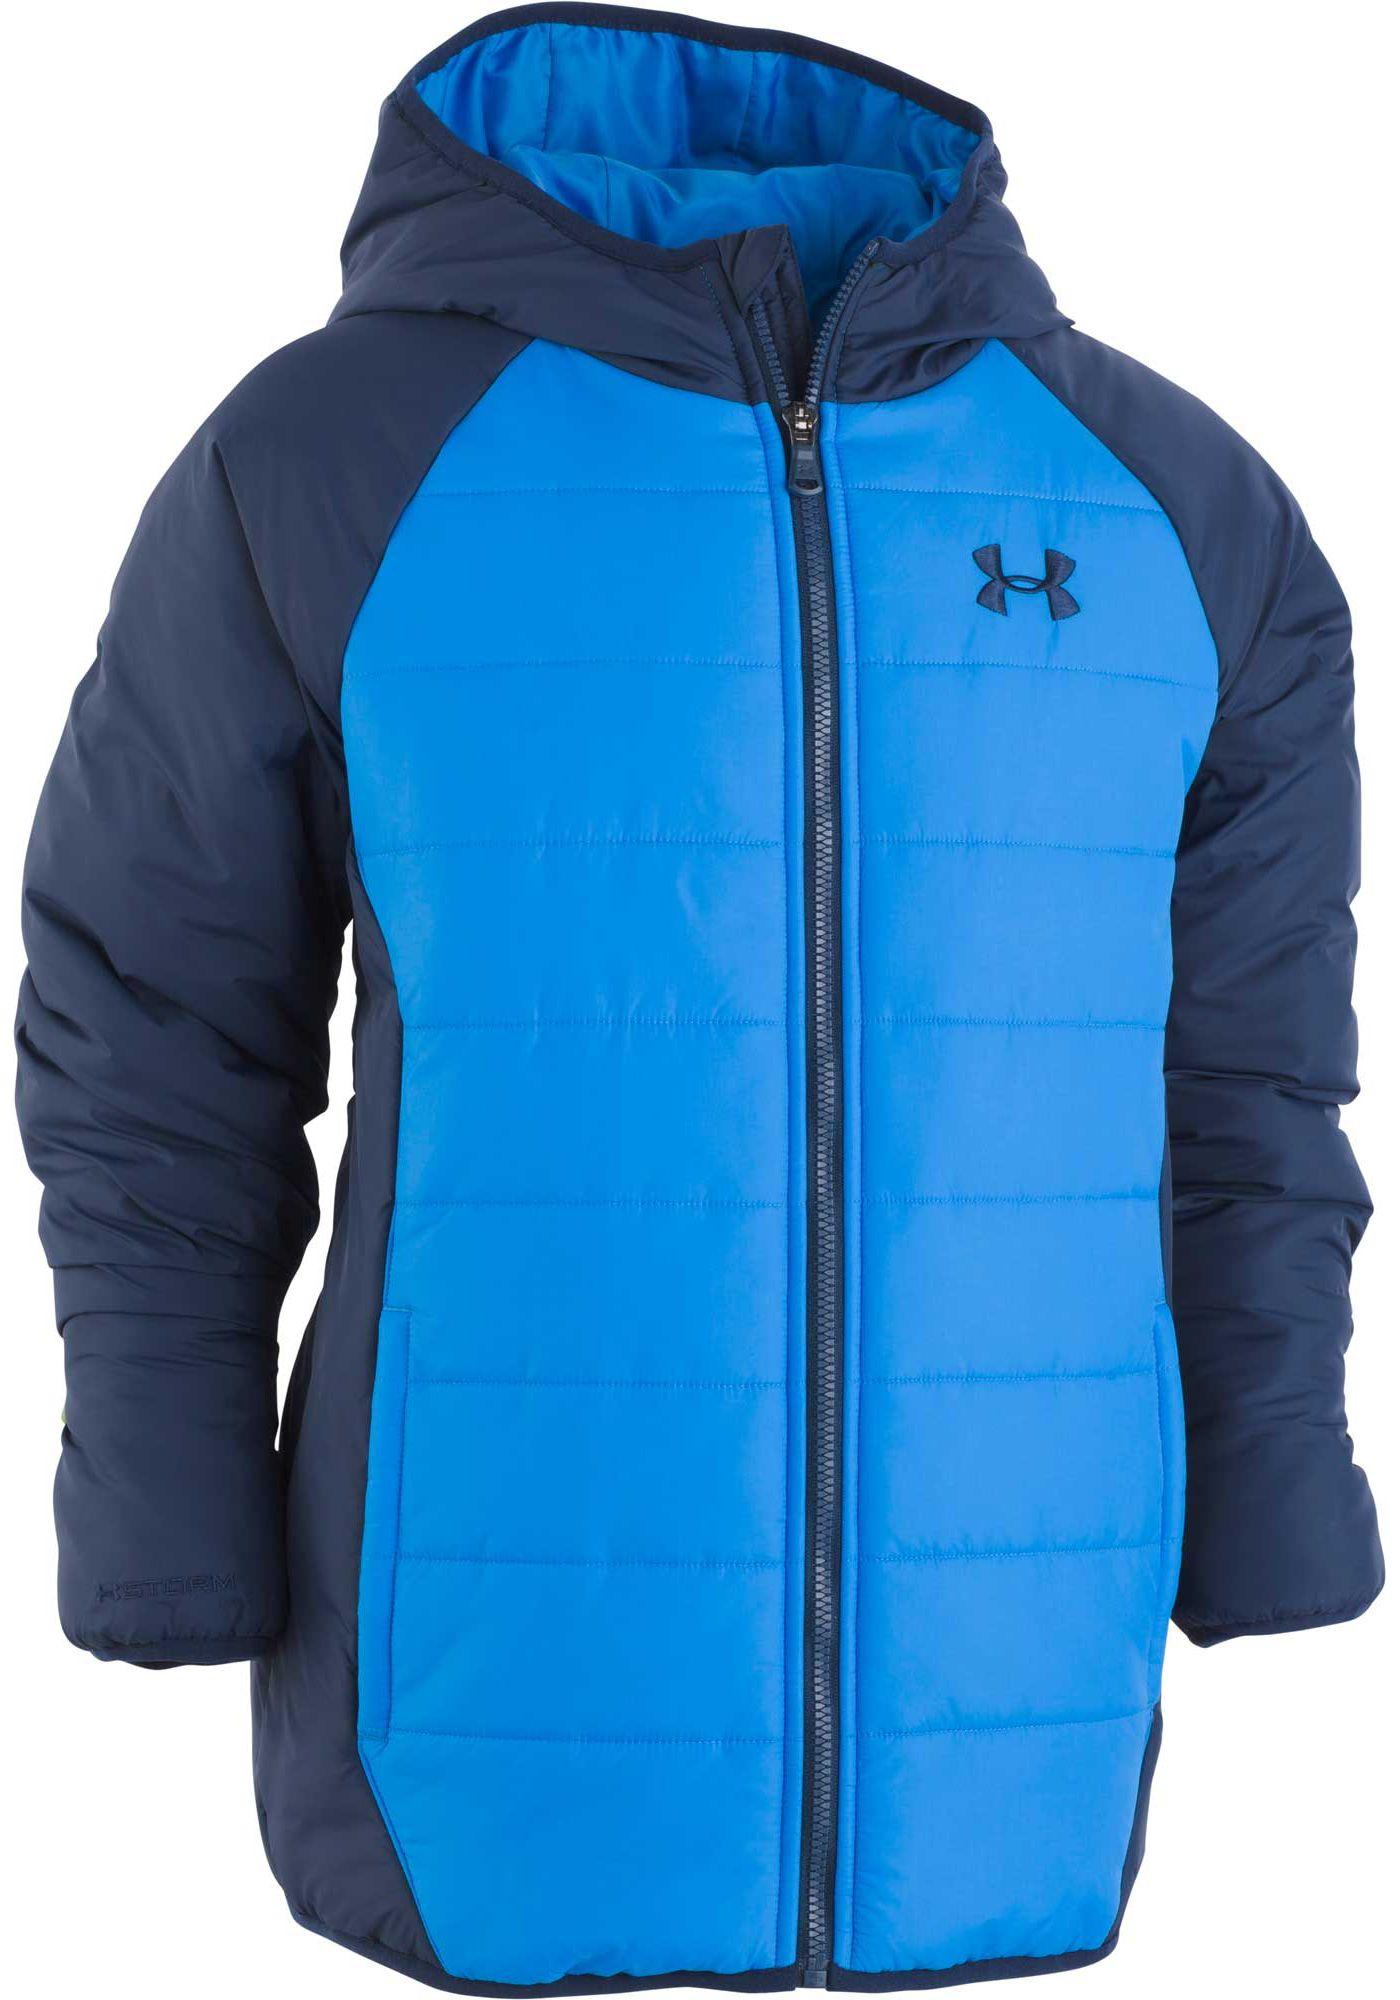 Under Armour Boys' Tuckerman Puffer Jacket